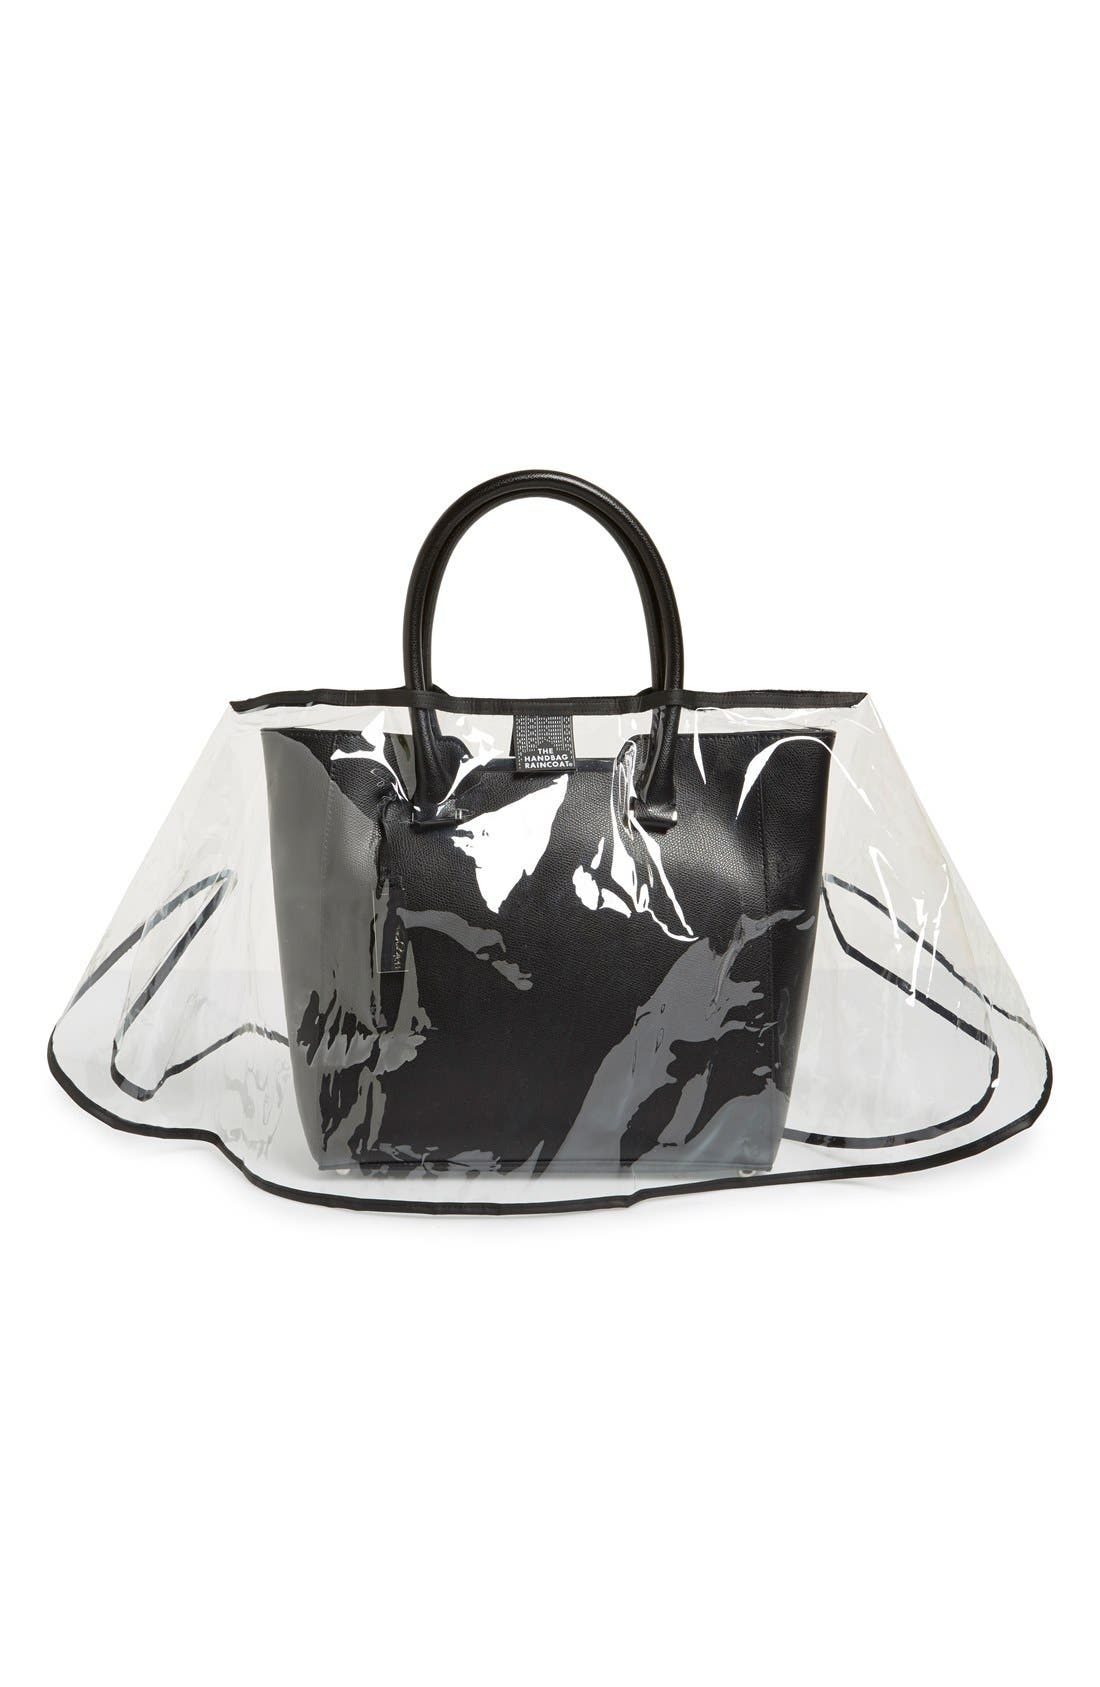 'Midi - City Slicker' Handbag Protector,                             Main thumbnail 1, color,                             Clear